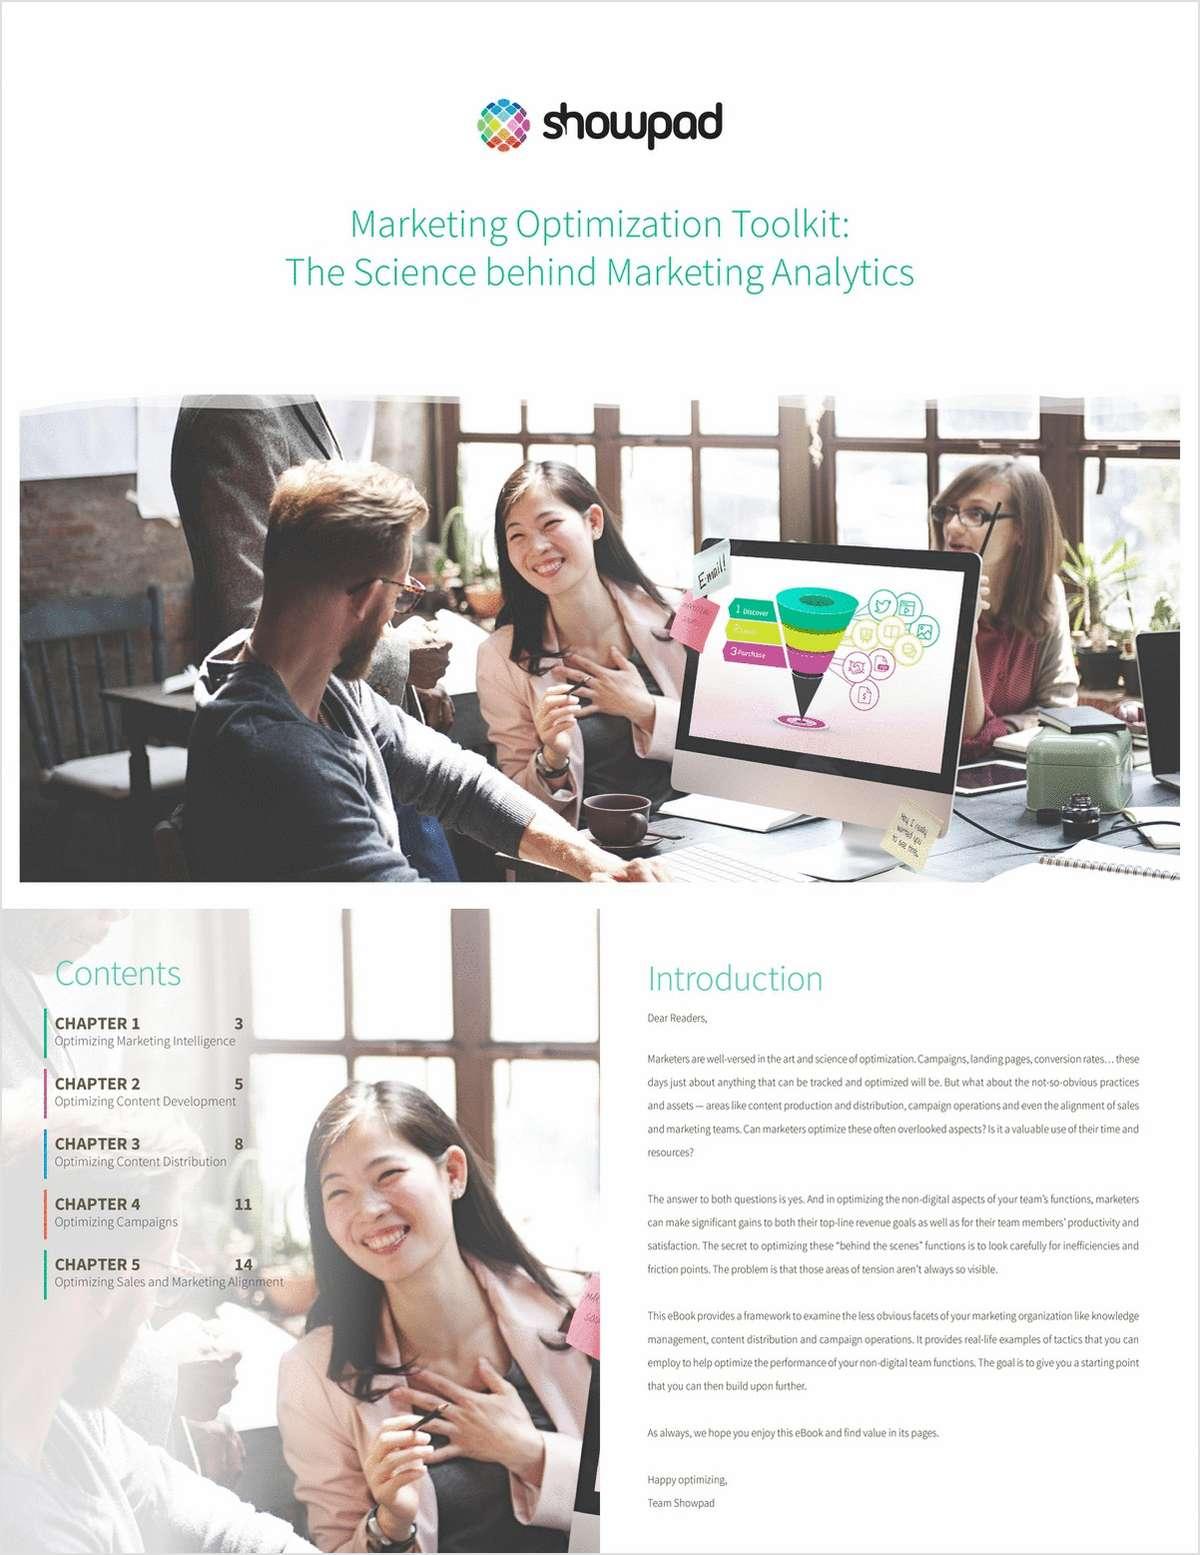 Marketing Optimization Toolkit: The Science behind Marketing Analytics